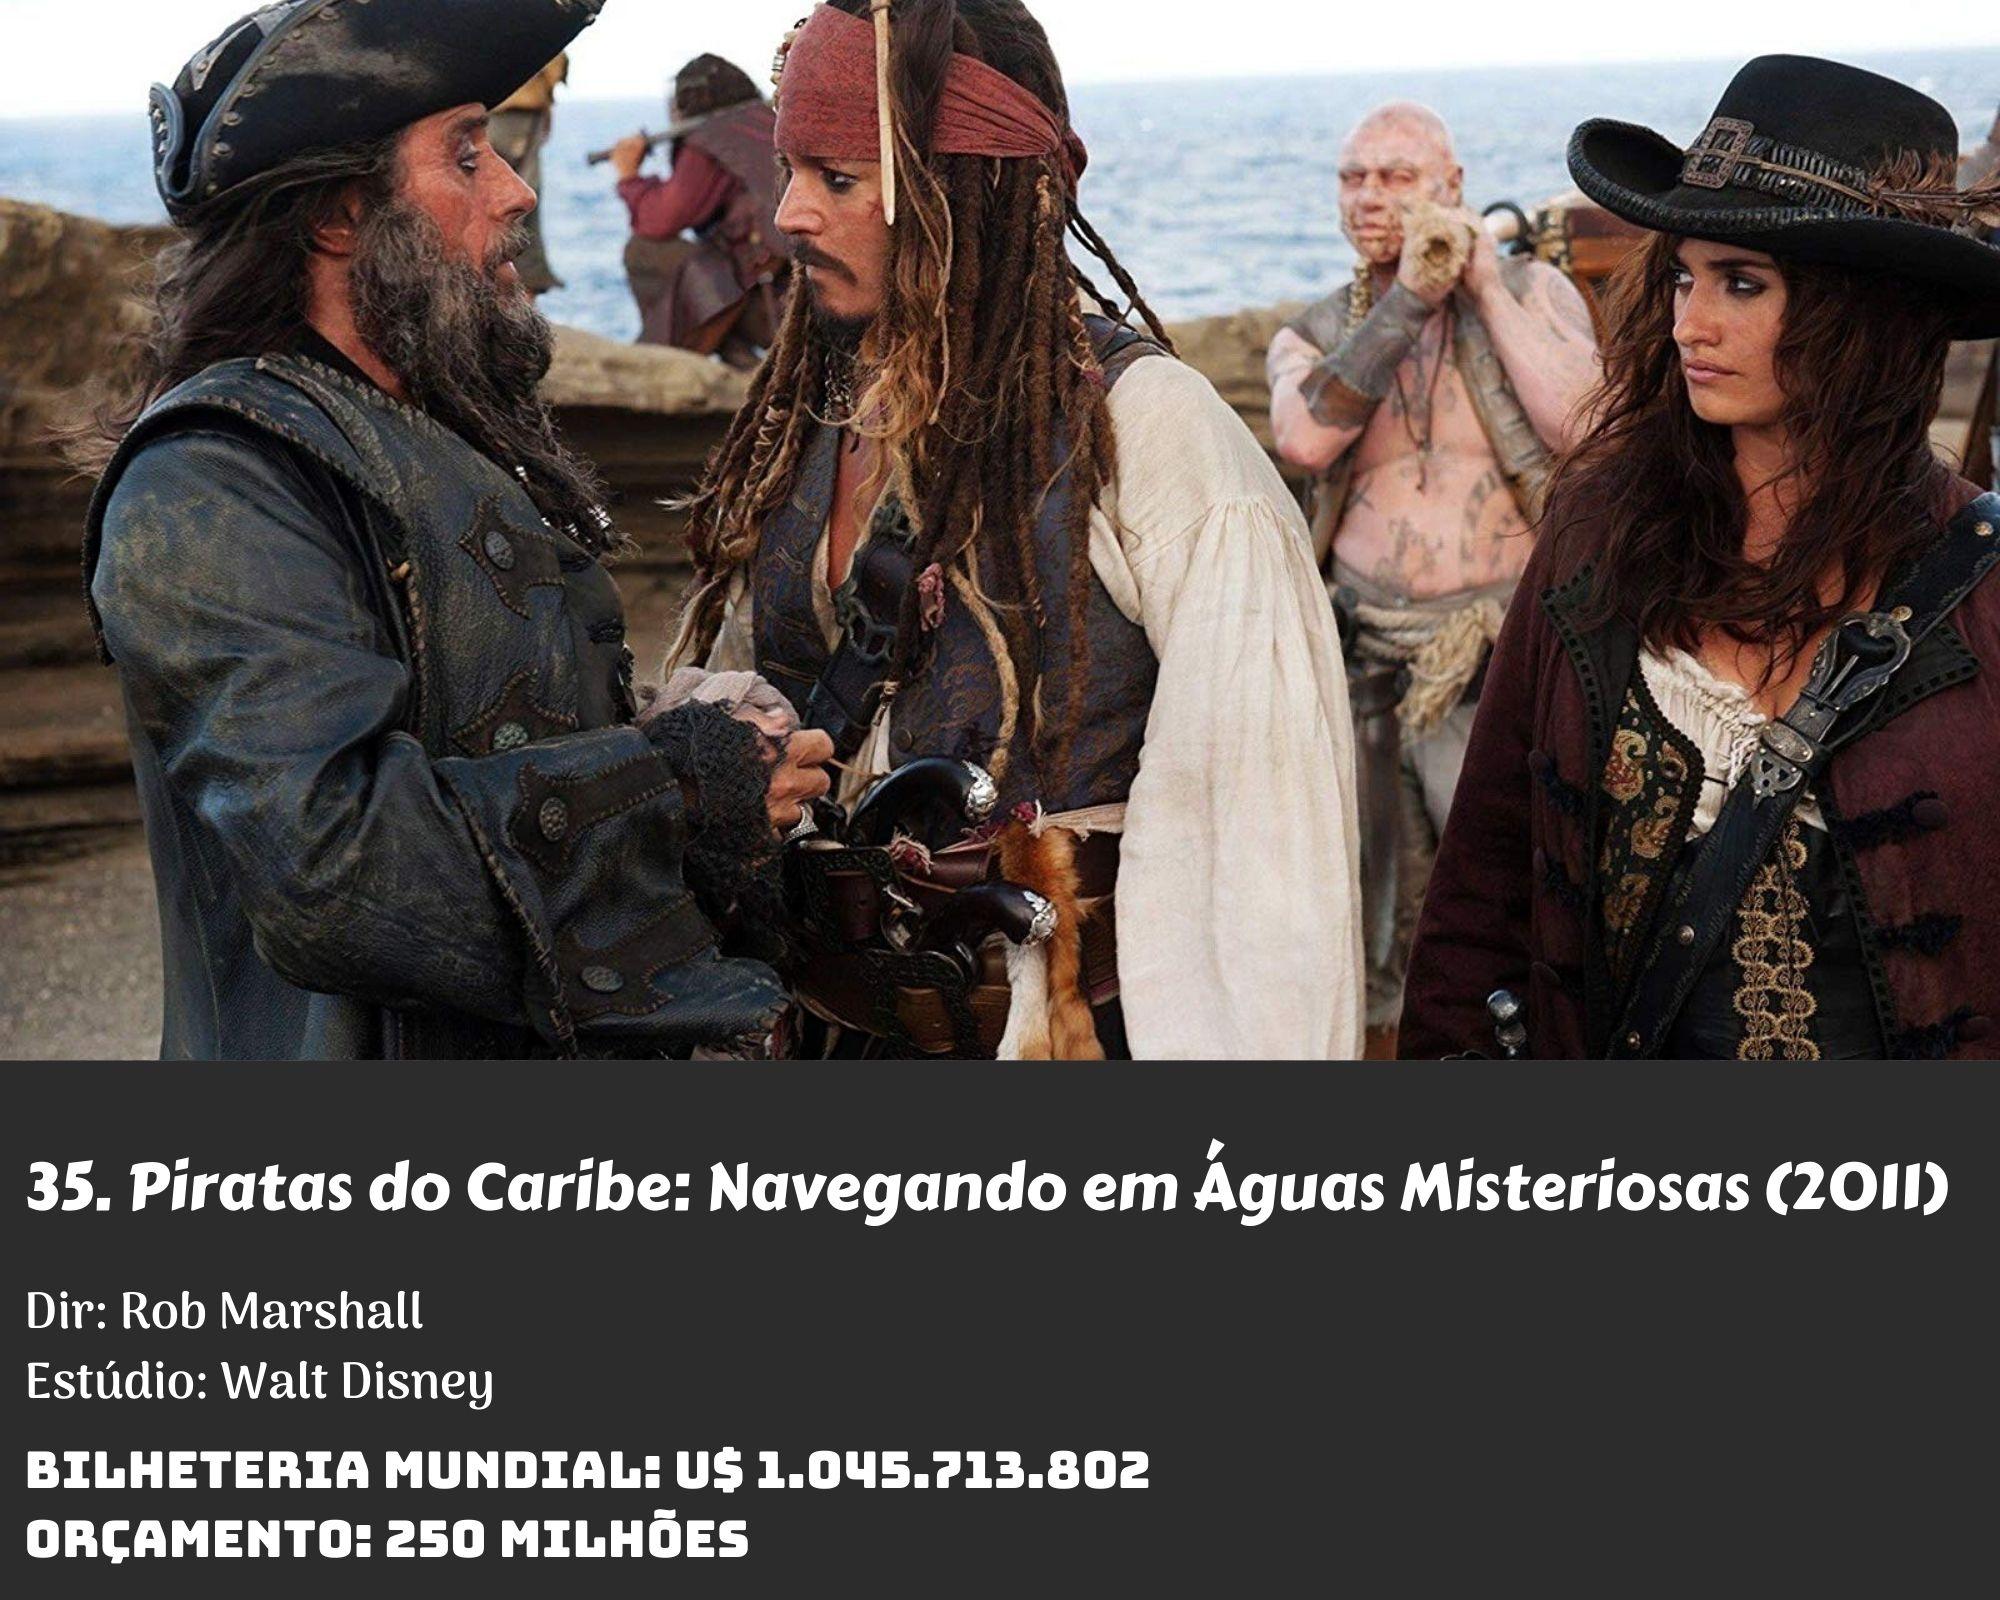 35. Pirates of the Caribbean On Stranger Tides